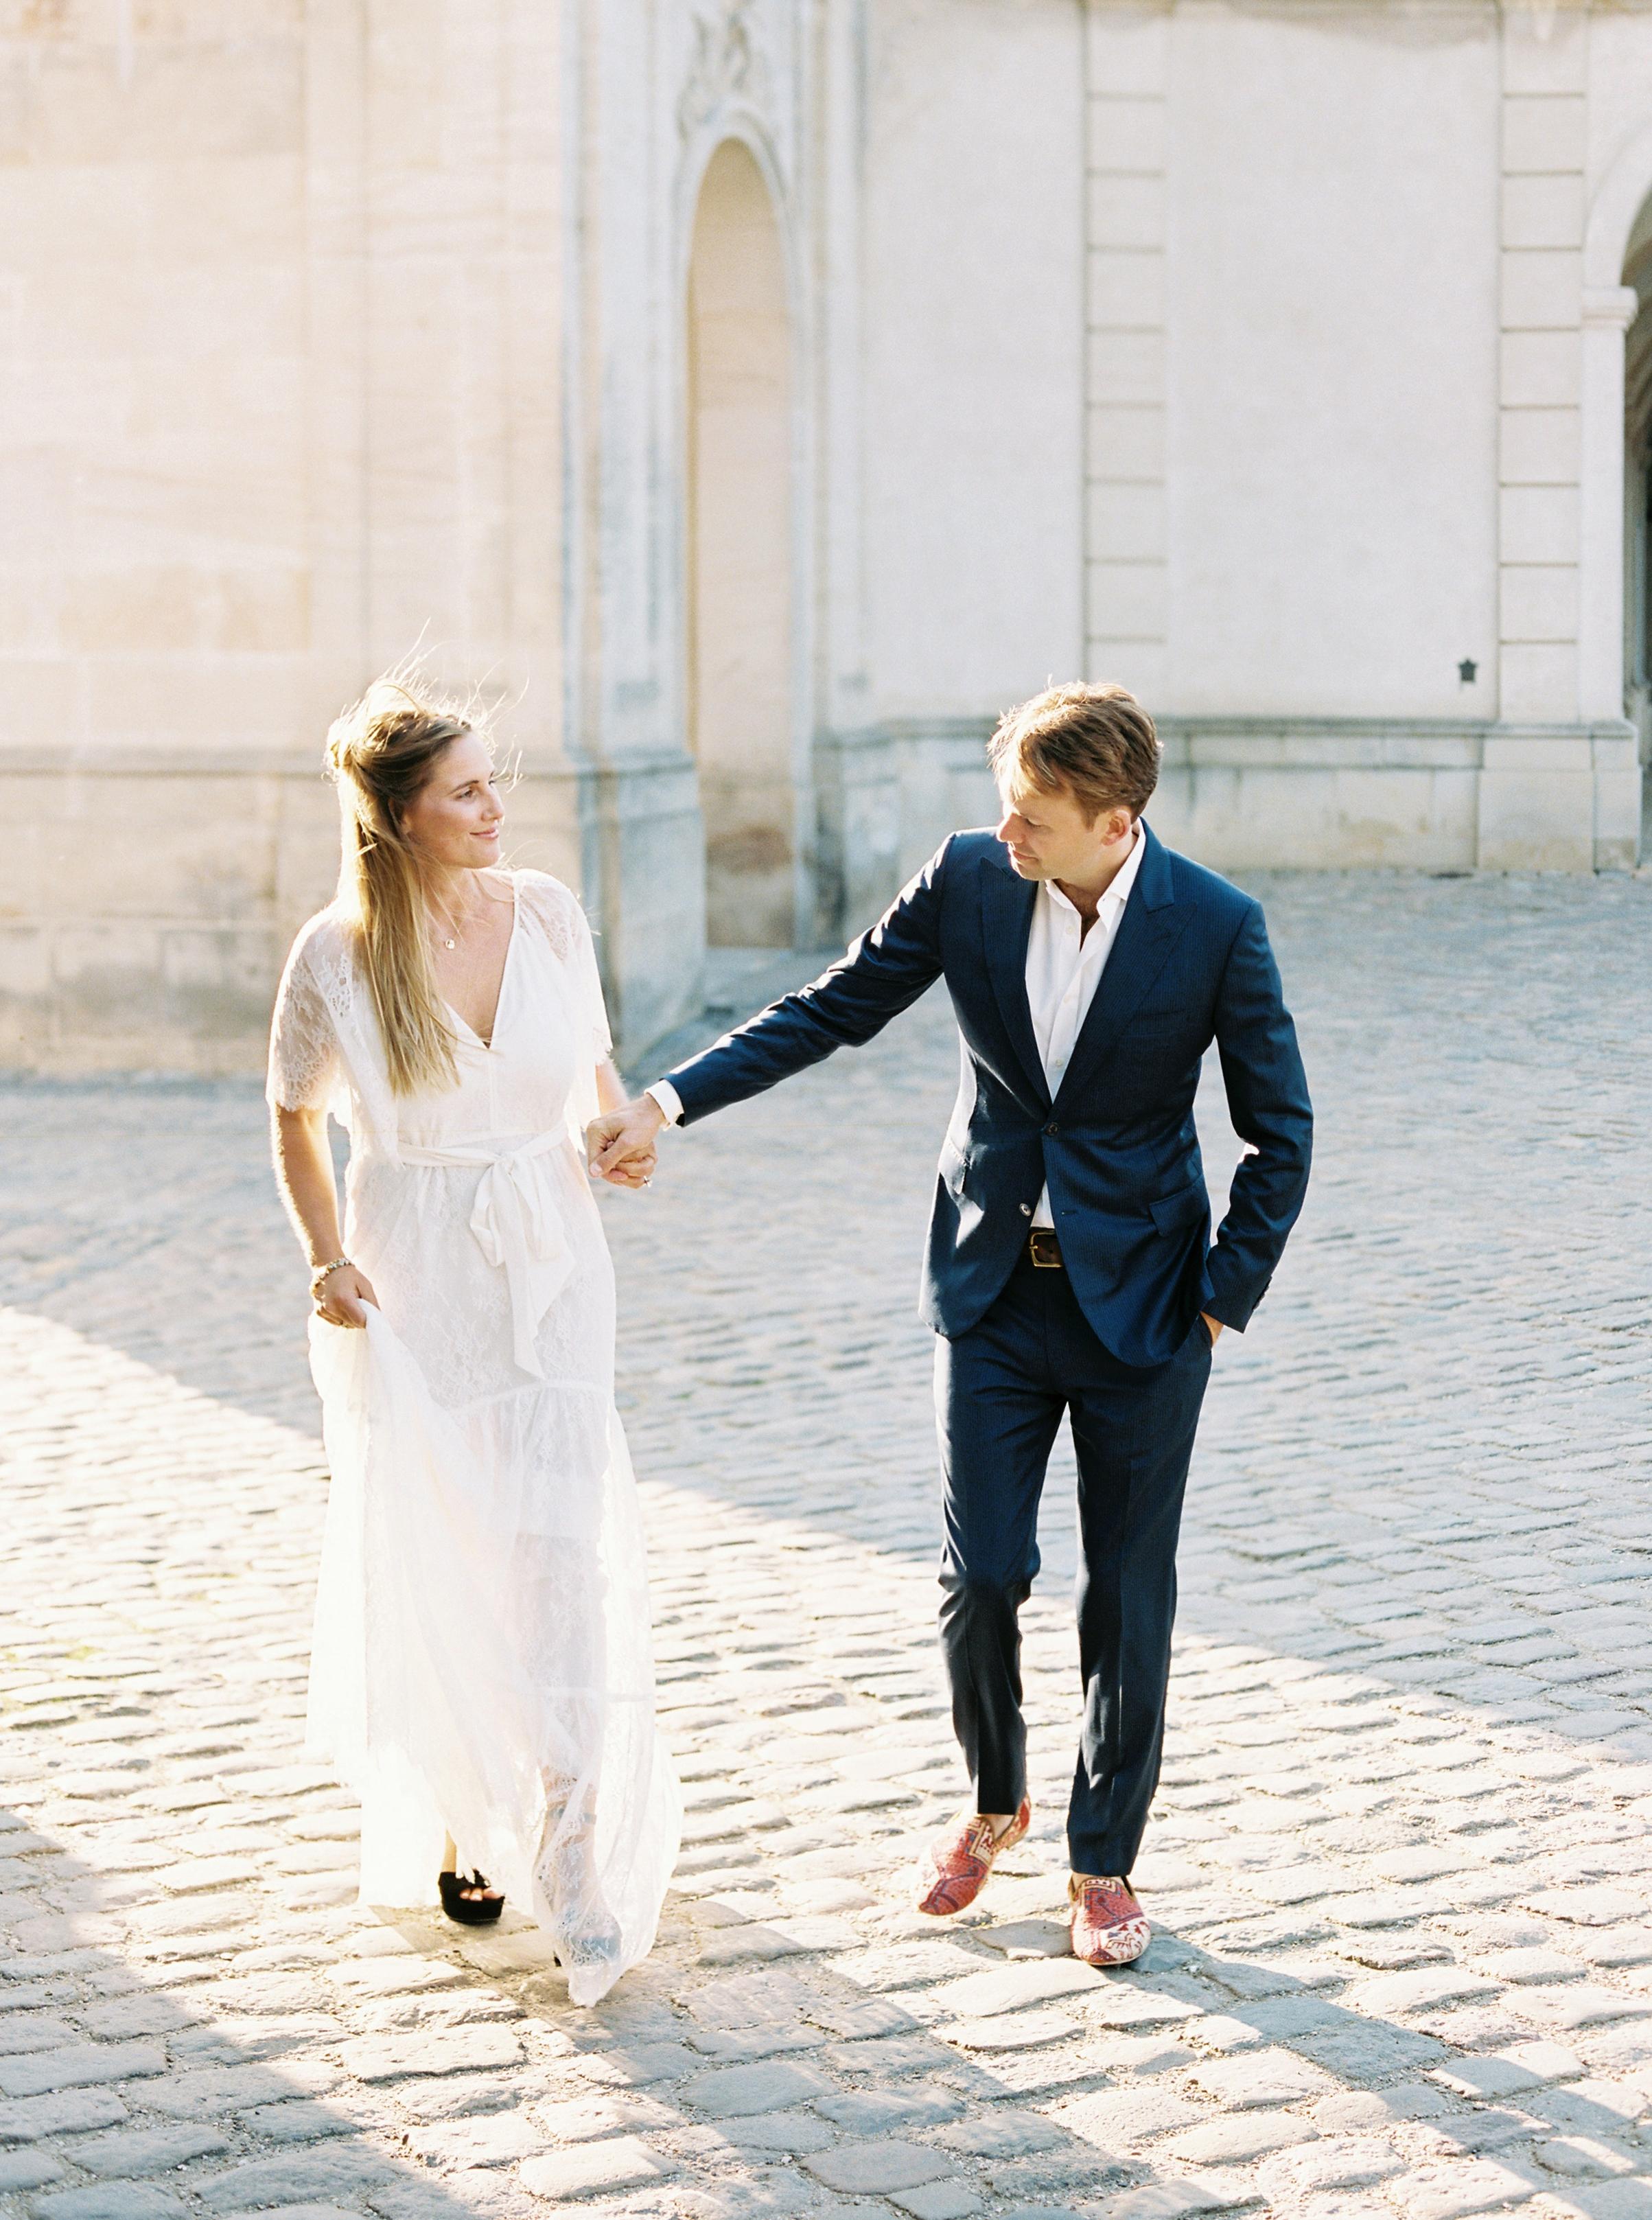 Kyle John l Fine Art Wedding Photography l Chicago, Copenhagen, California, New York, Destination l Blog l Alexis and Zach_Copenhagen Part 2_30